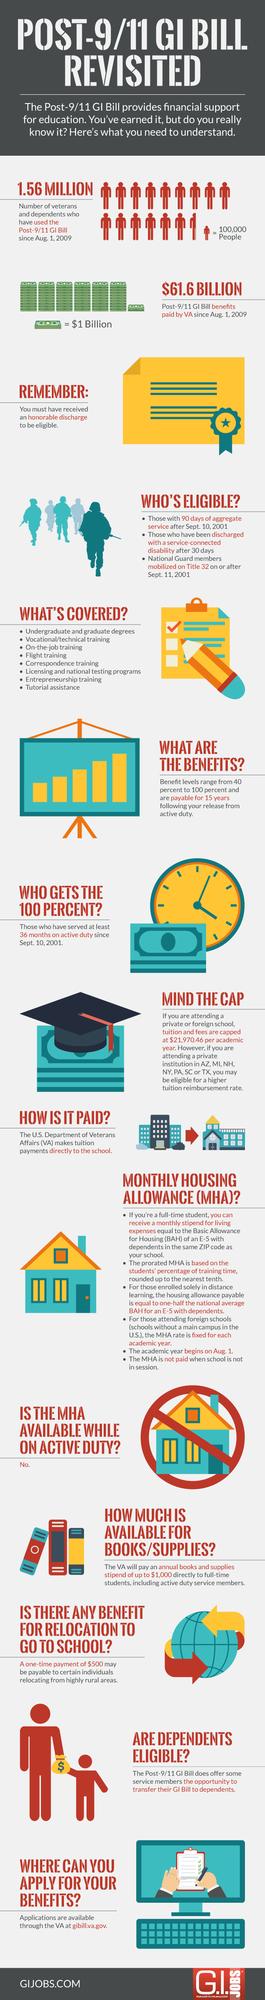 Post911_Infographic